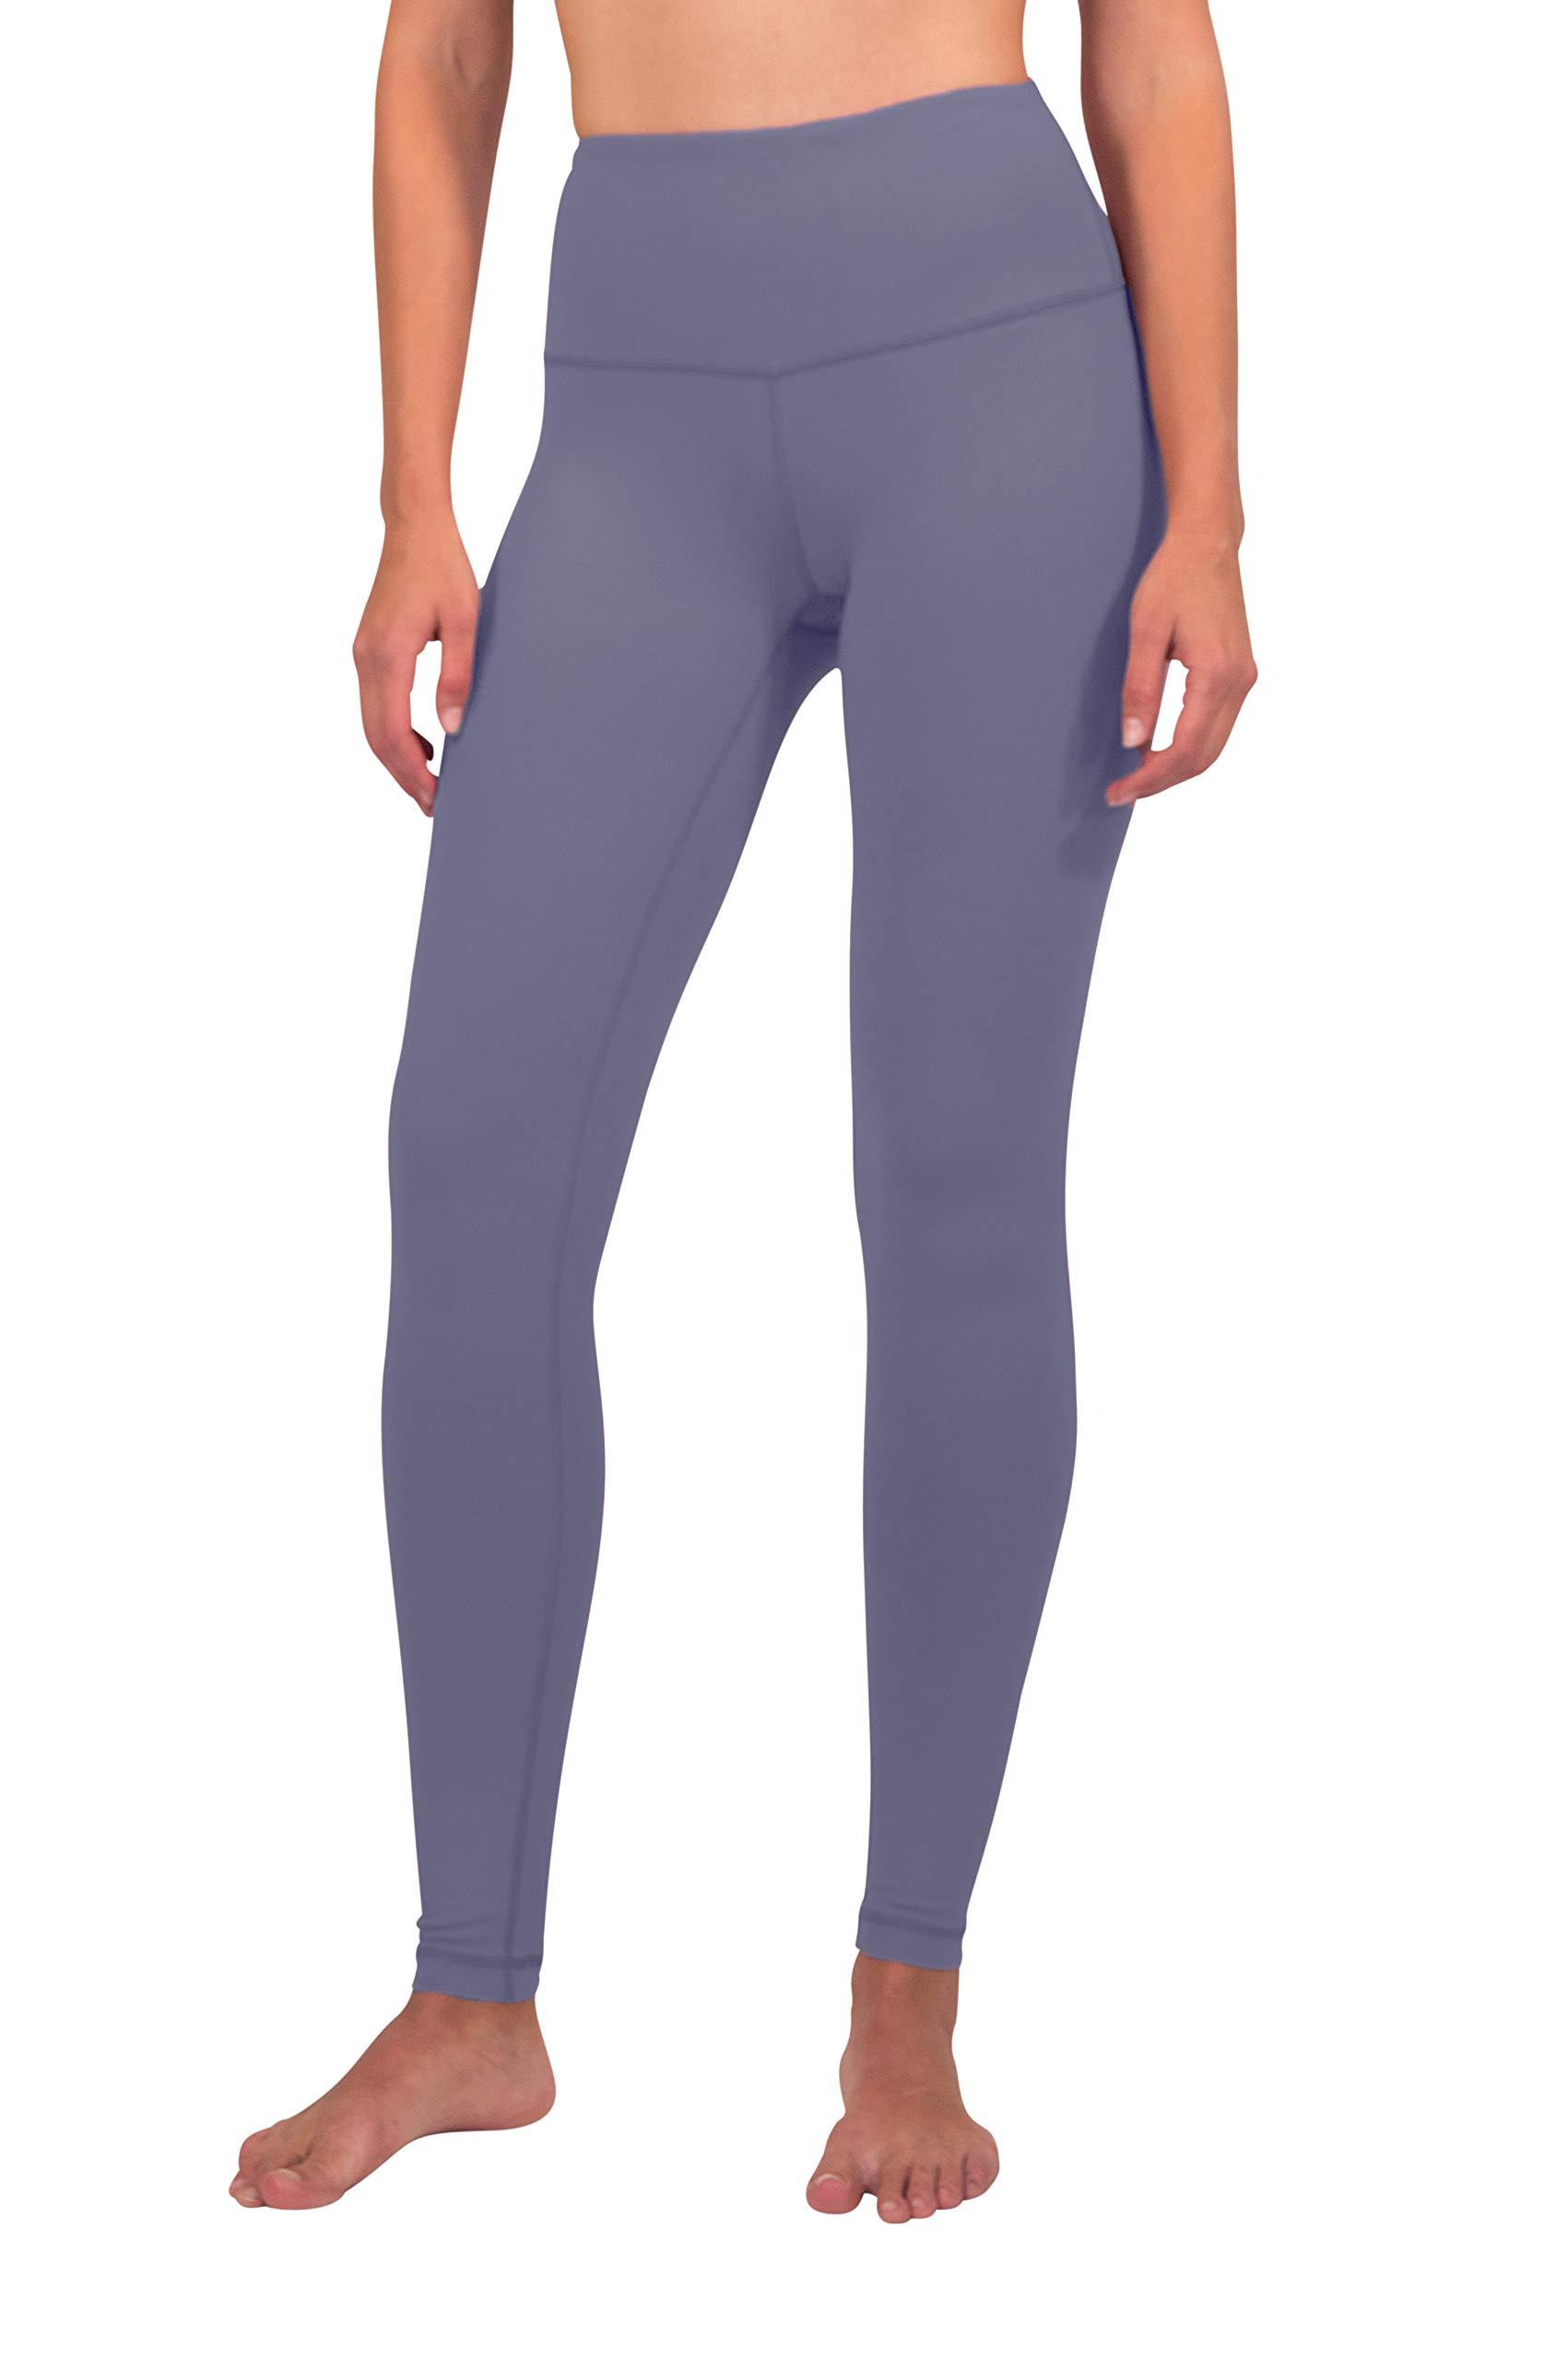 90 Degree By Reflex - High Waist Power Flex Legging – Tummy Control - Blueberry Ice - XS